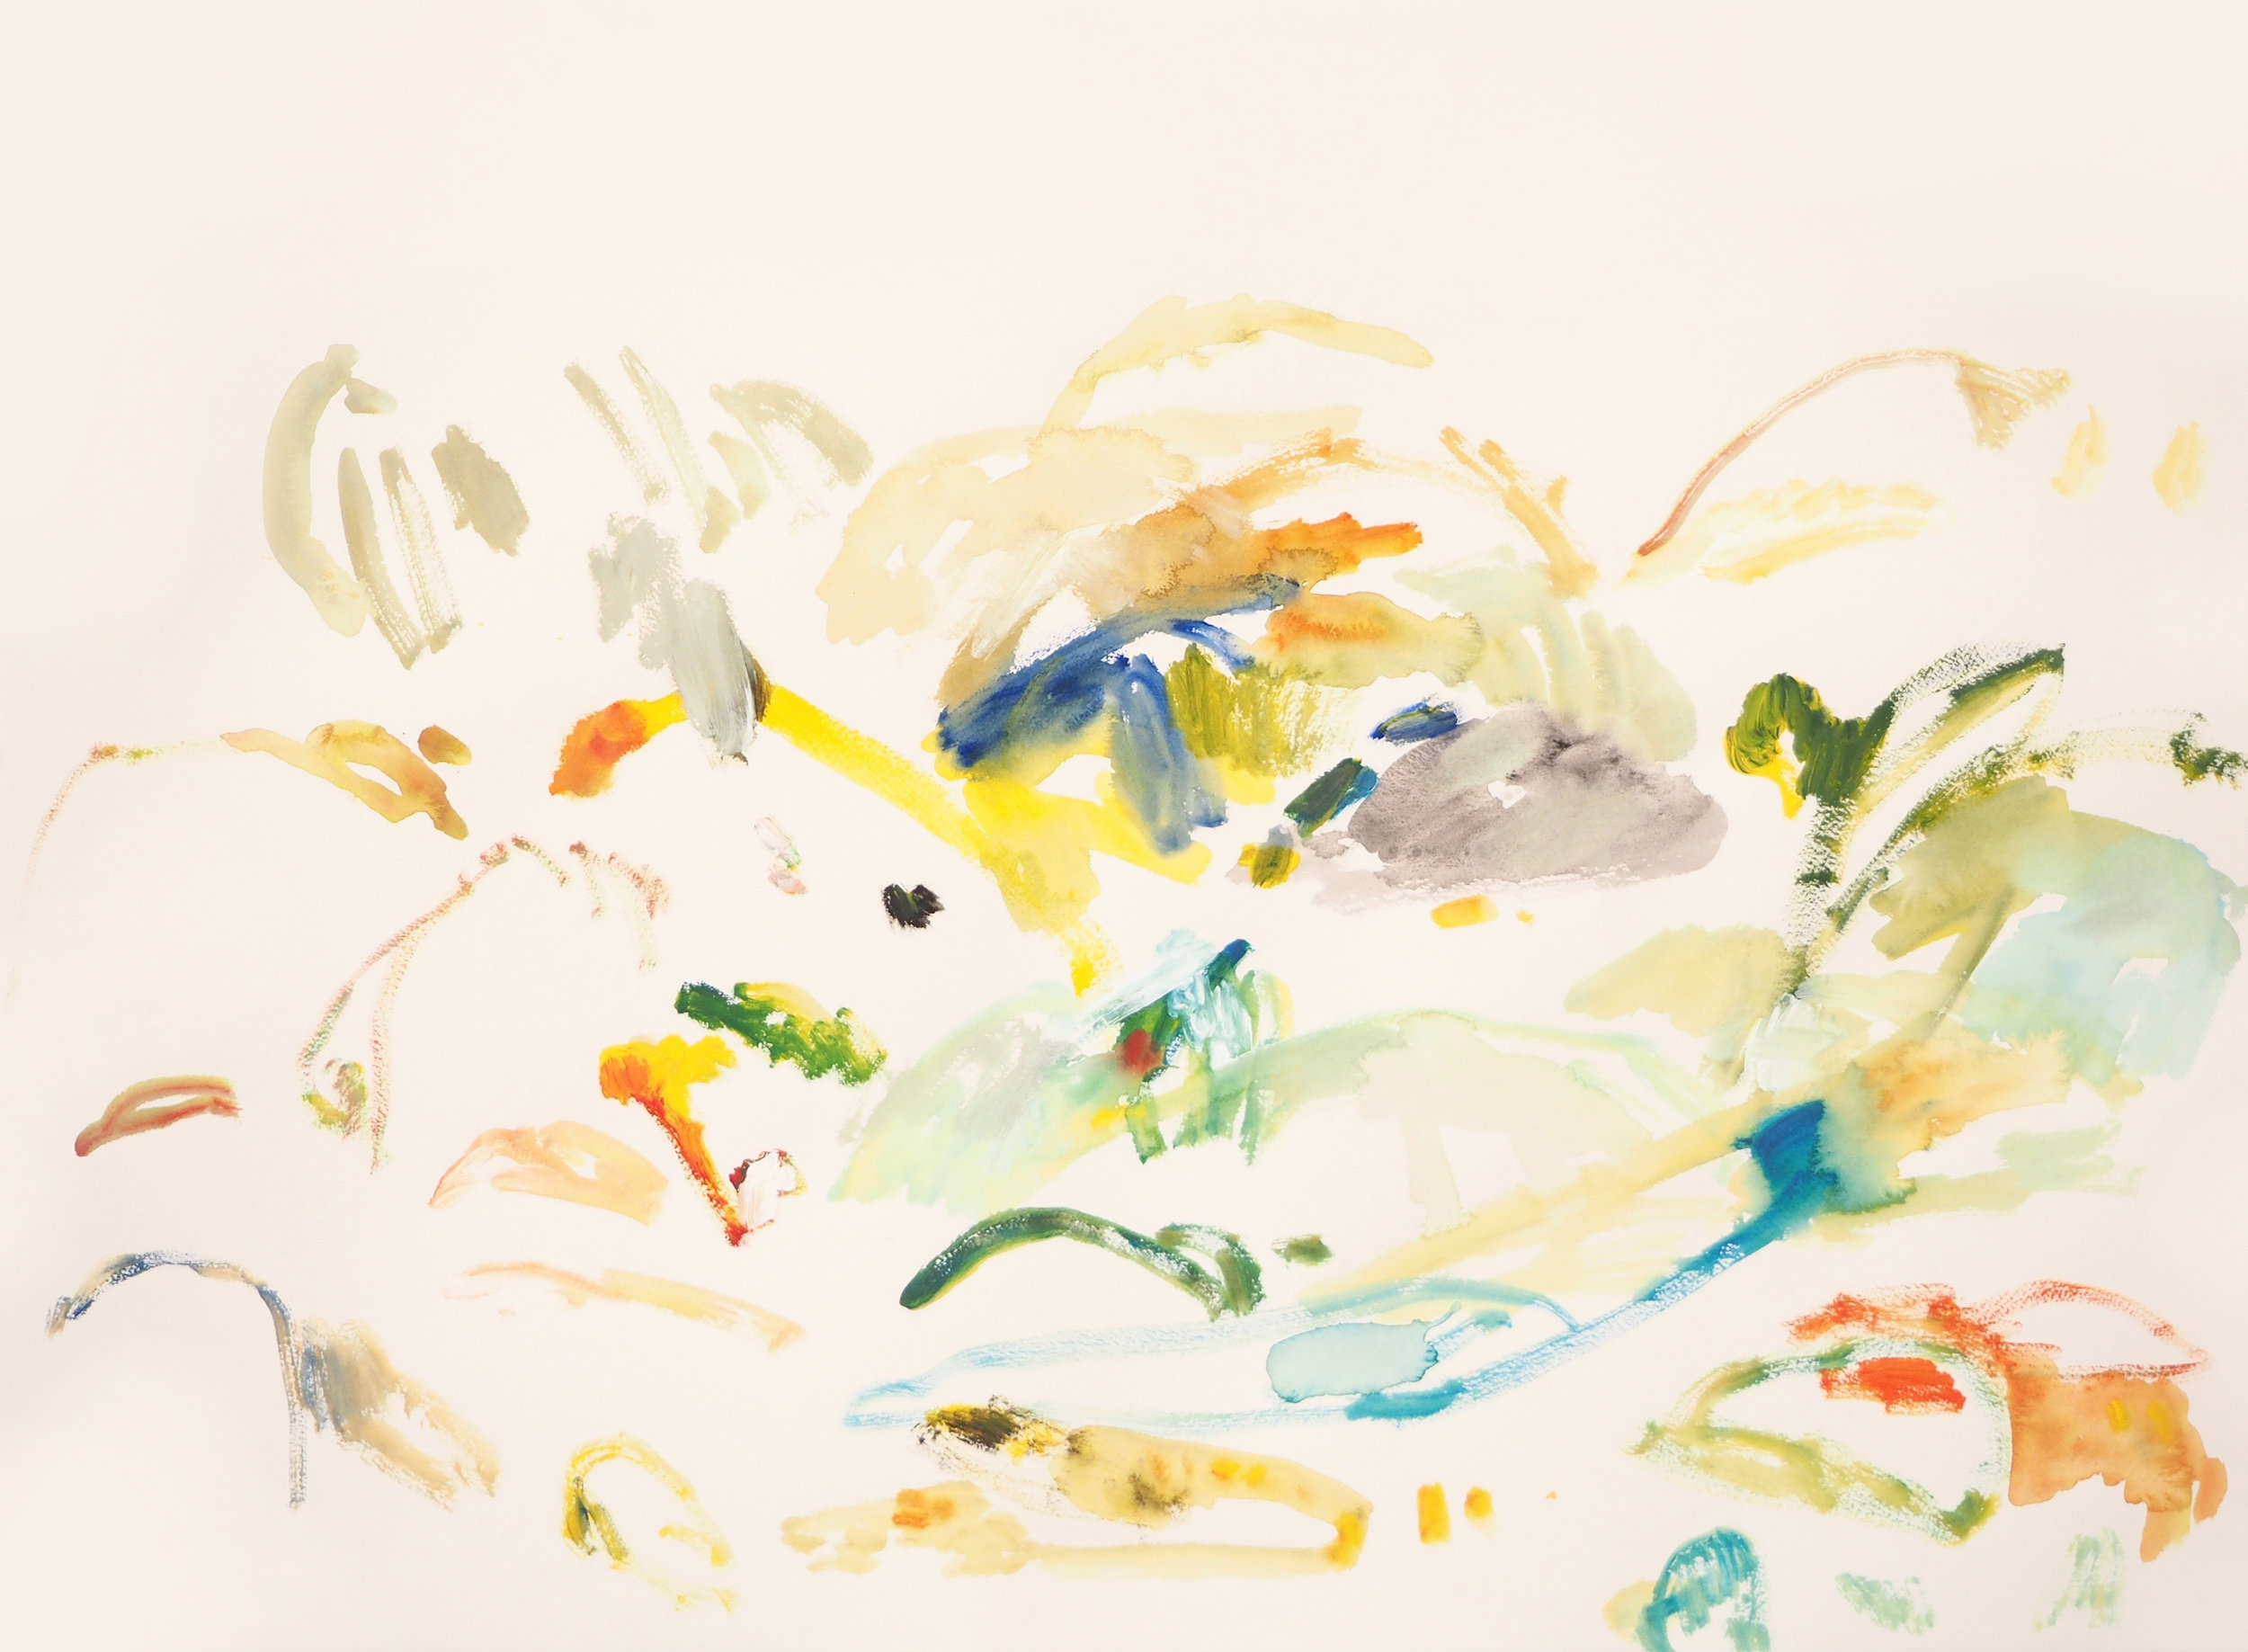 Mparntwe VI , 2017 Acrylic on paper 56 x 76 cm